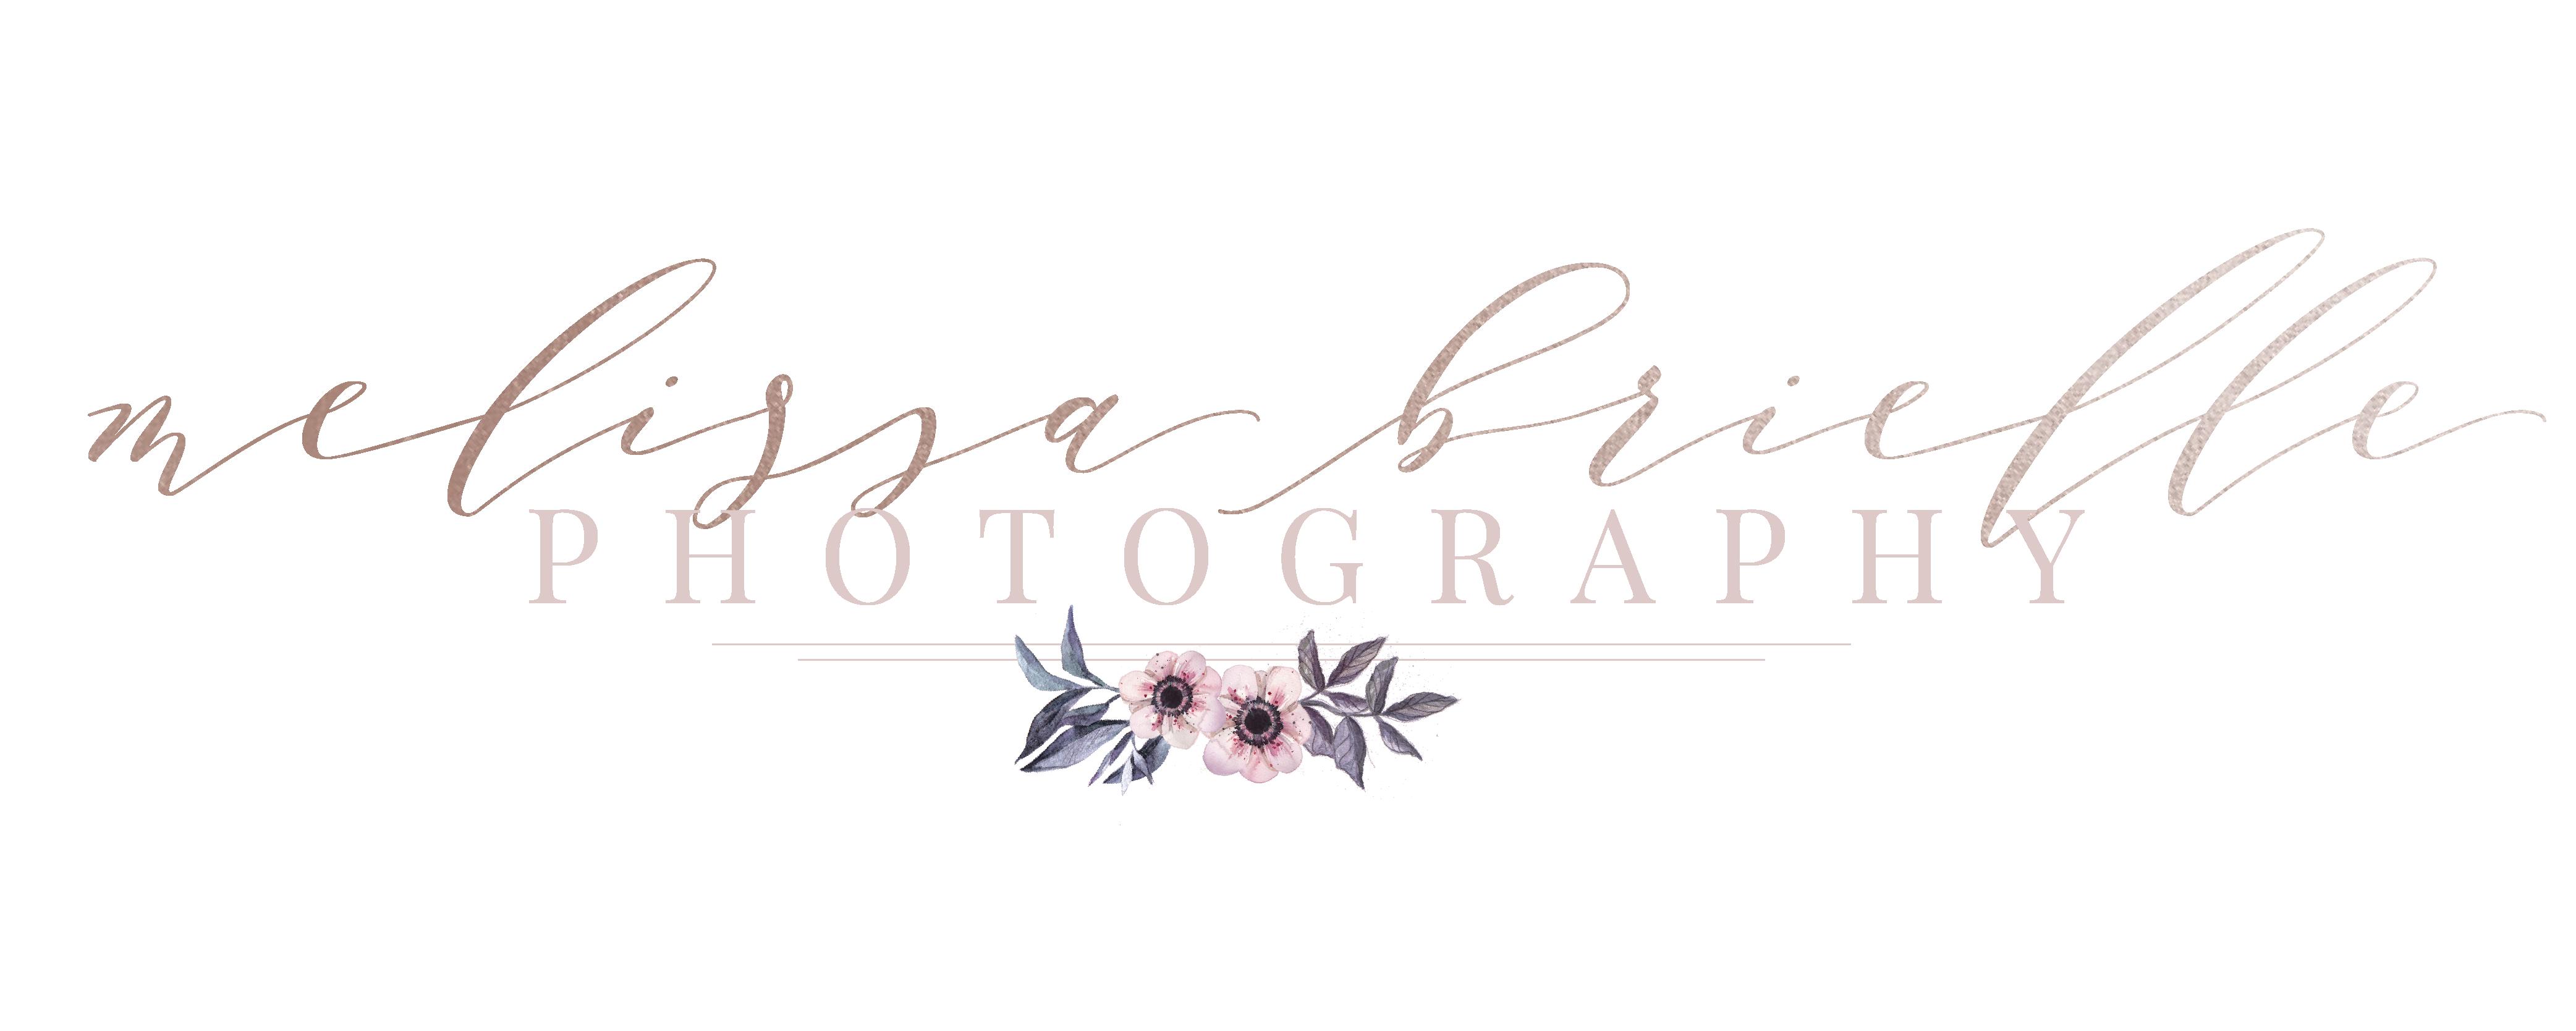 Melissa Brielle Photogrtaphy